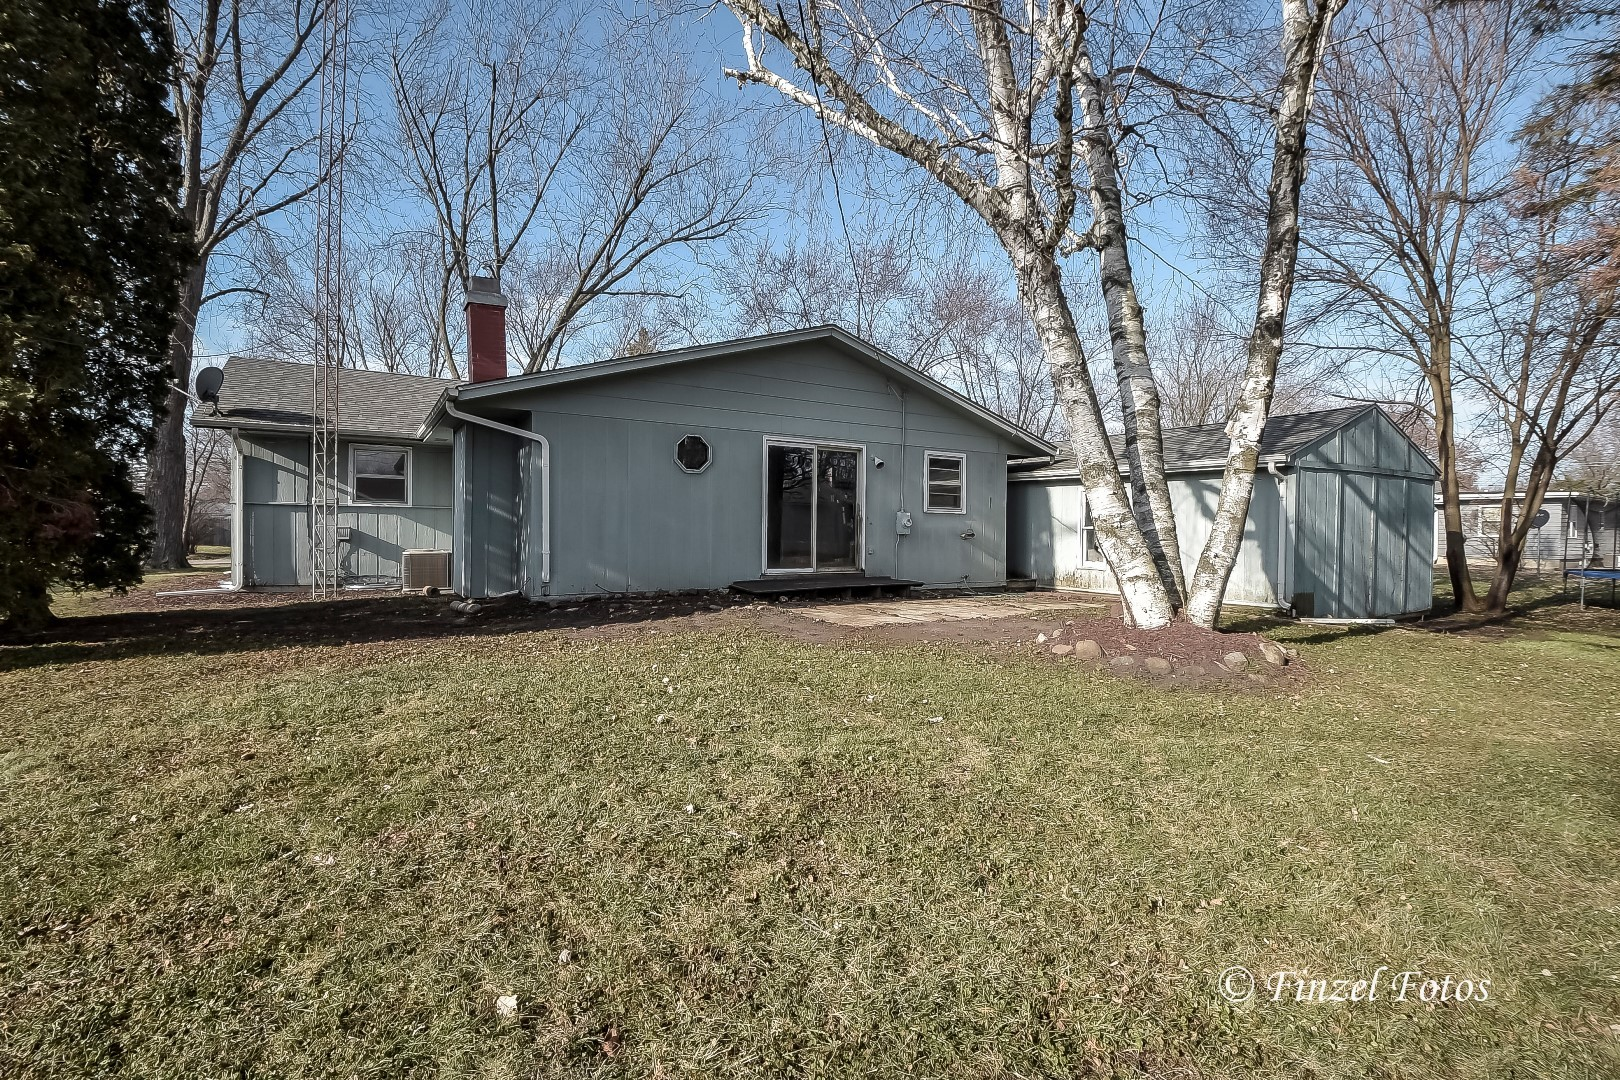 425 Kishwaukee, Marengo, Illinois, 60152